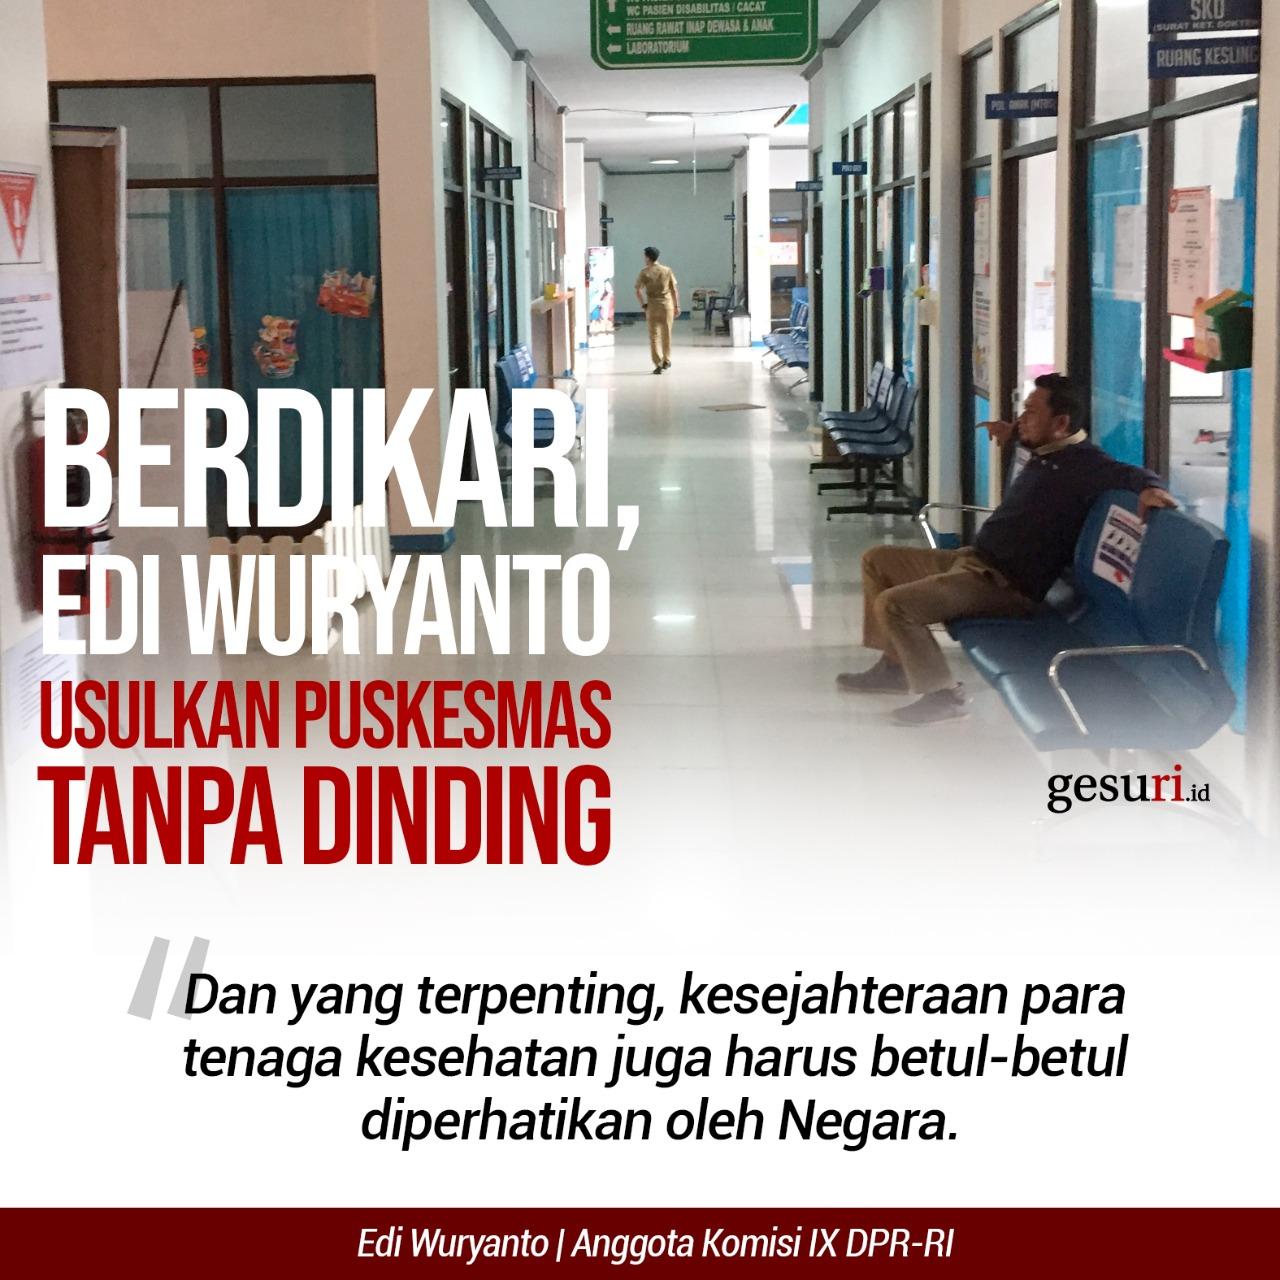 Berdikari, Edi Wuryanto Usulkan Puskesmas Tanpa Dinding